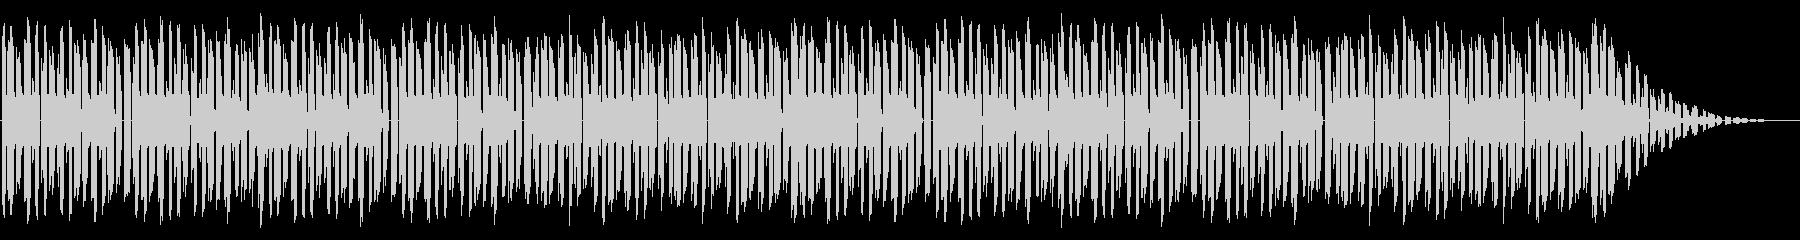 NES 和風 A03-1(ステージ2) の未再生の波形